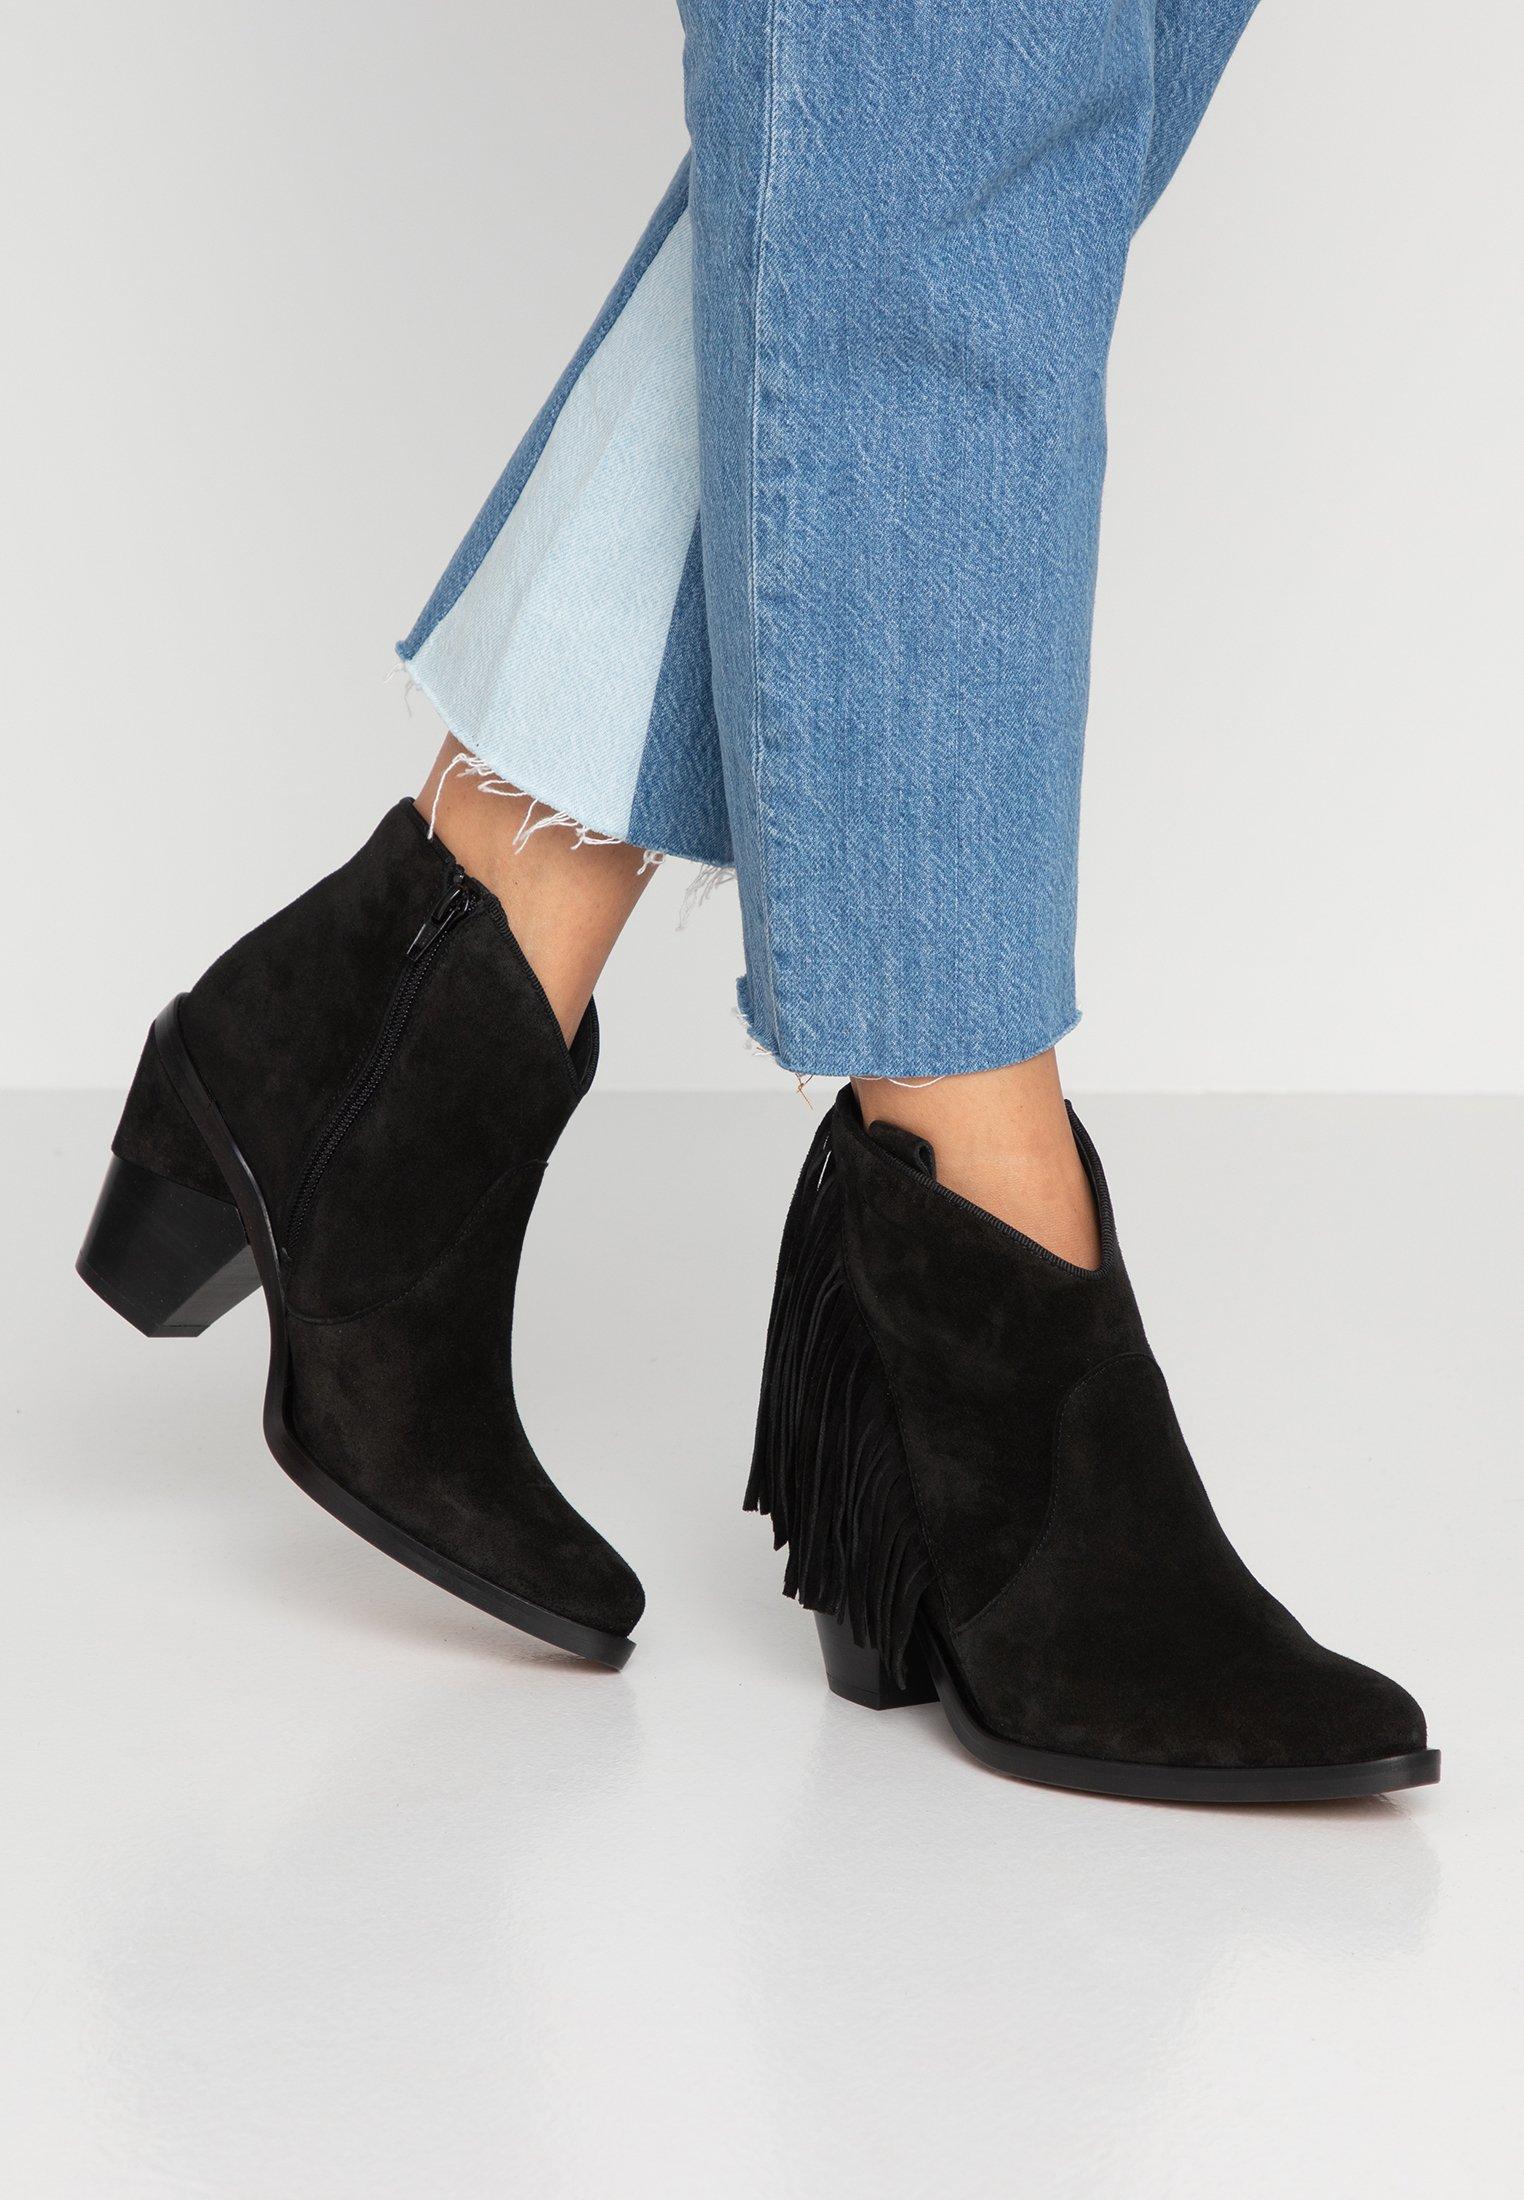 Kanna SUVA - Ankle Boot - black | Damen Schuhe 2020